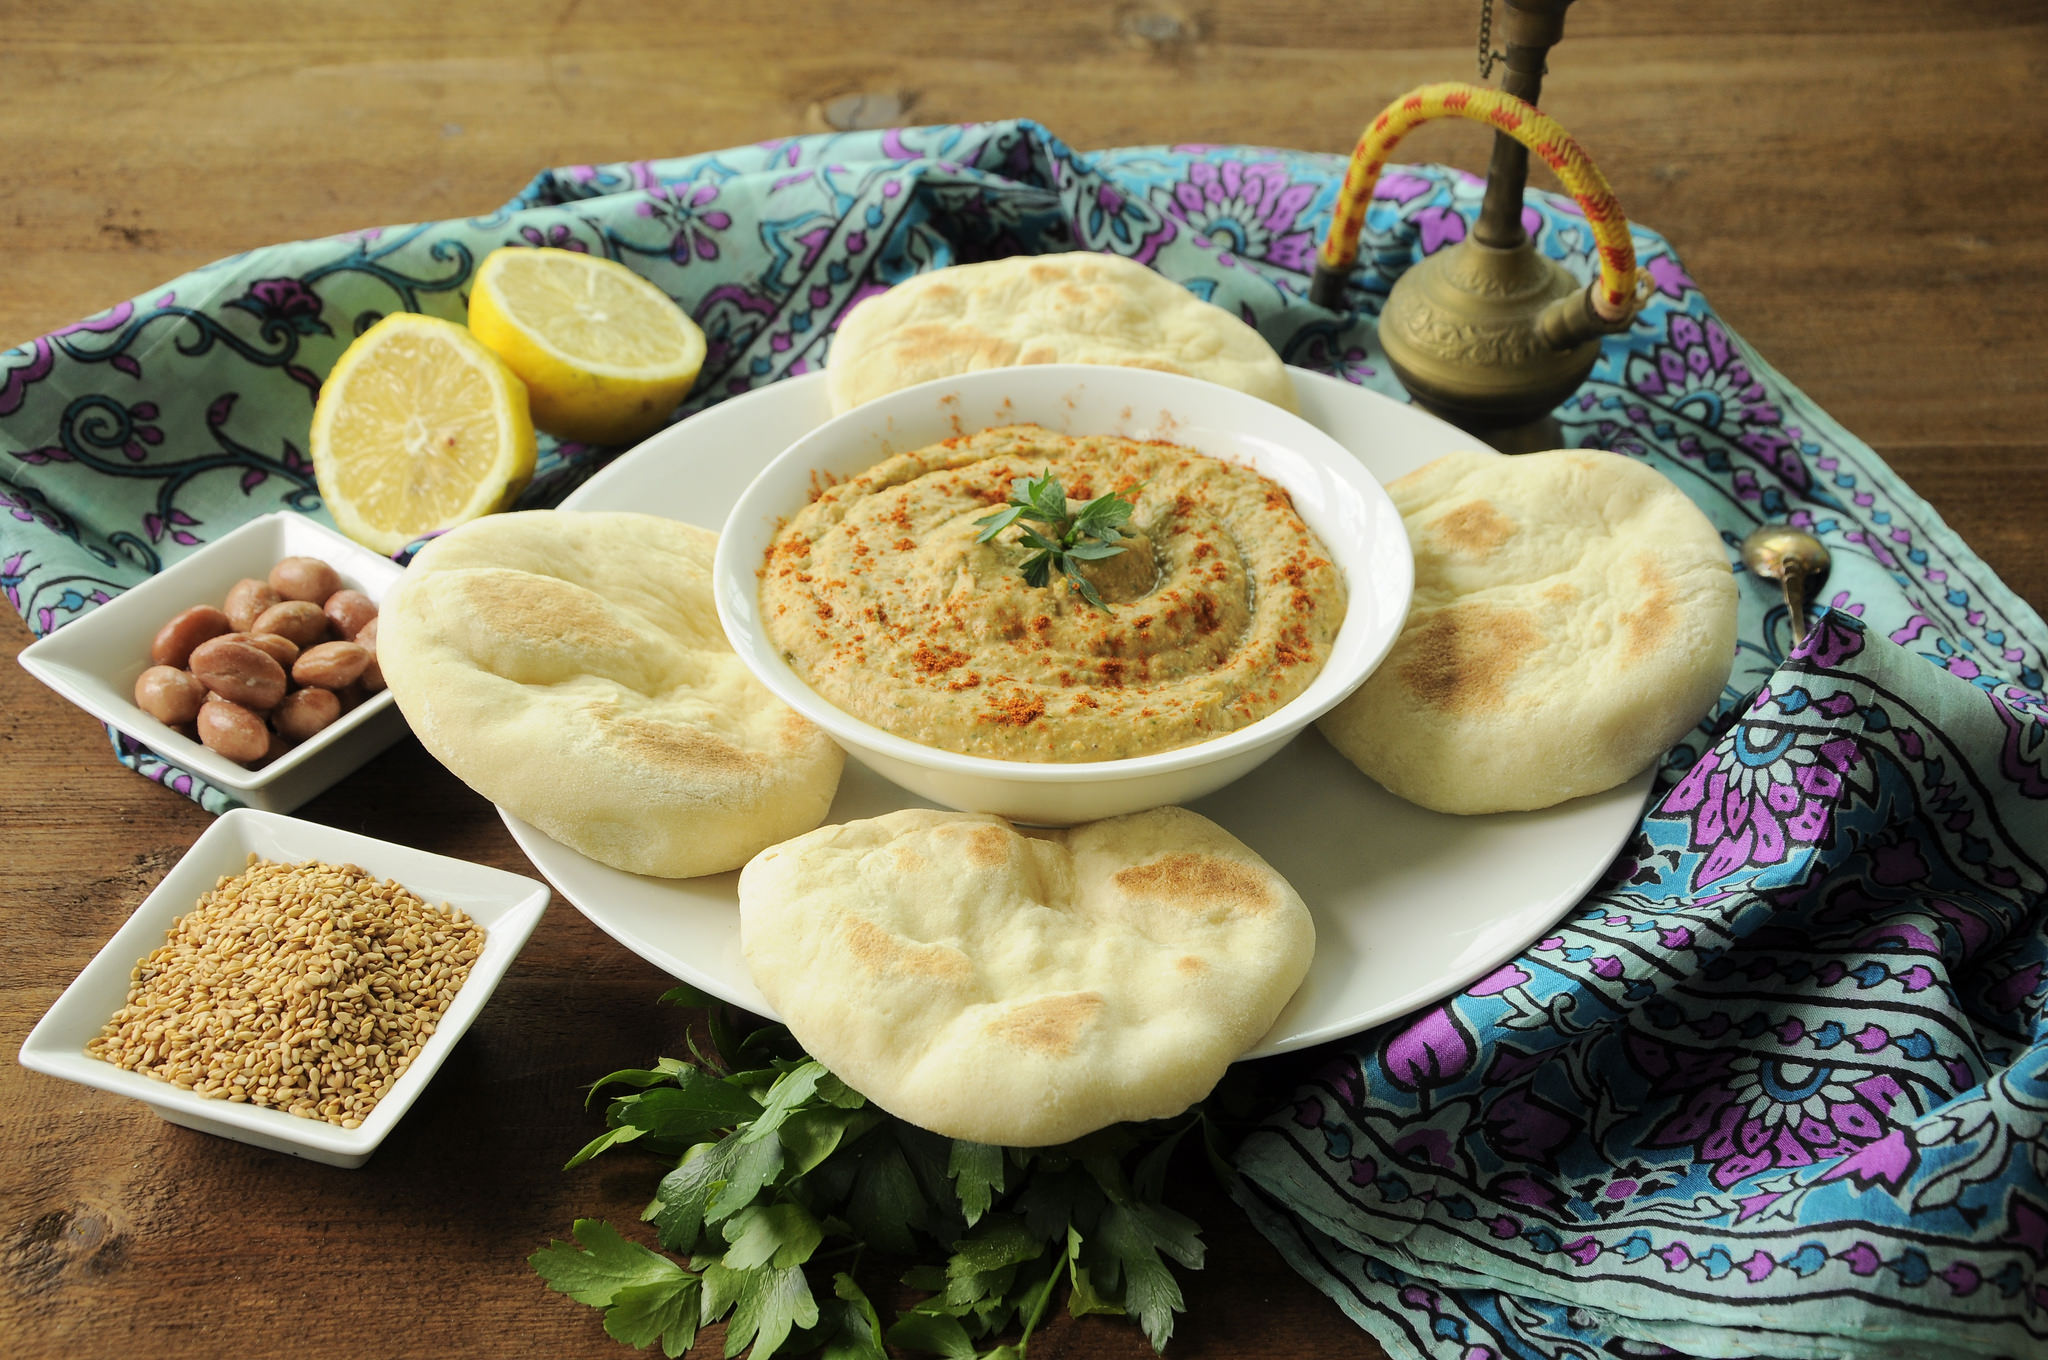 Ricetta Pane Arabo Per Kebab Bimby.Pane Arabo Bimby Tm31 Tm5 In Padella